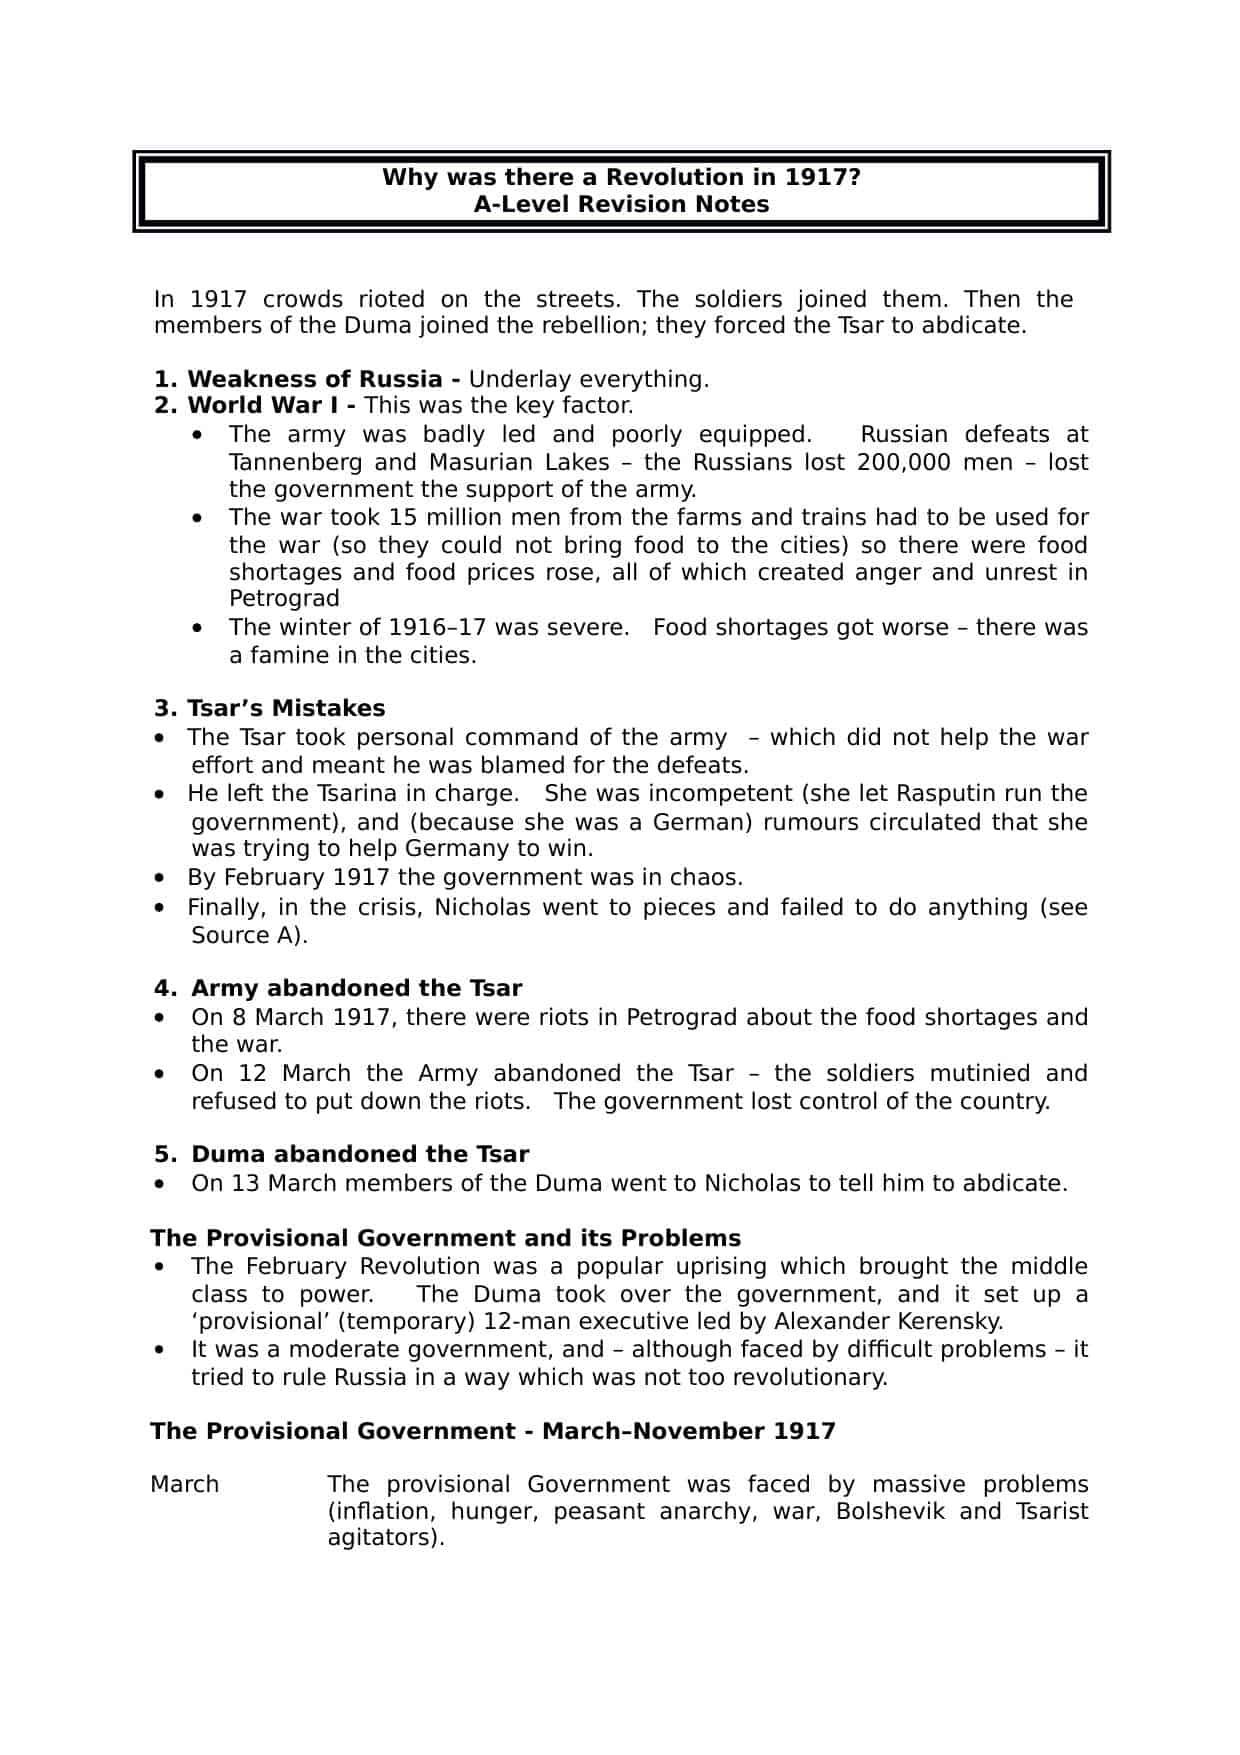 Dissertation binding service newcastle city hall